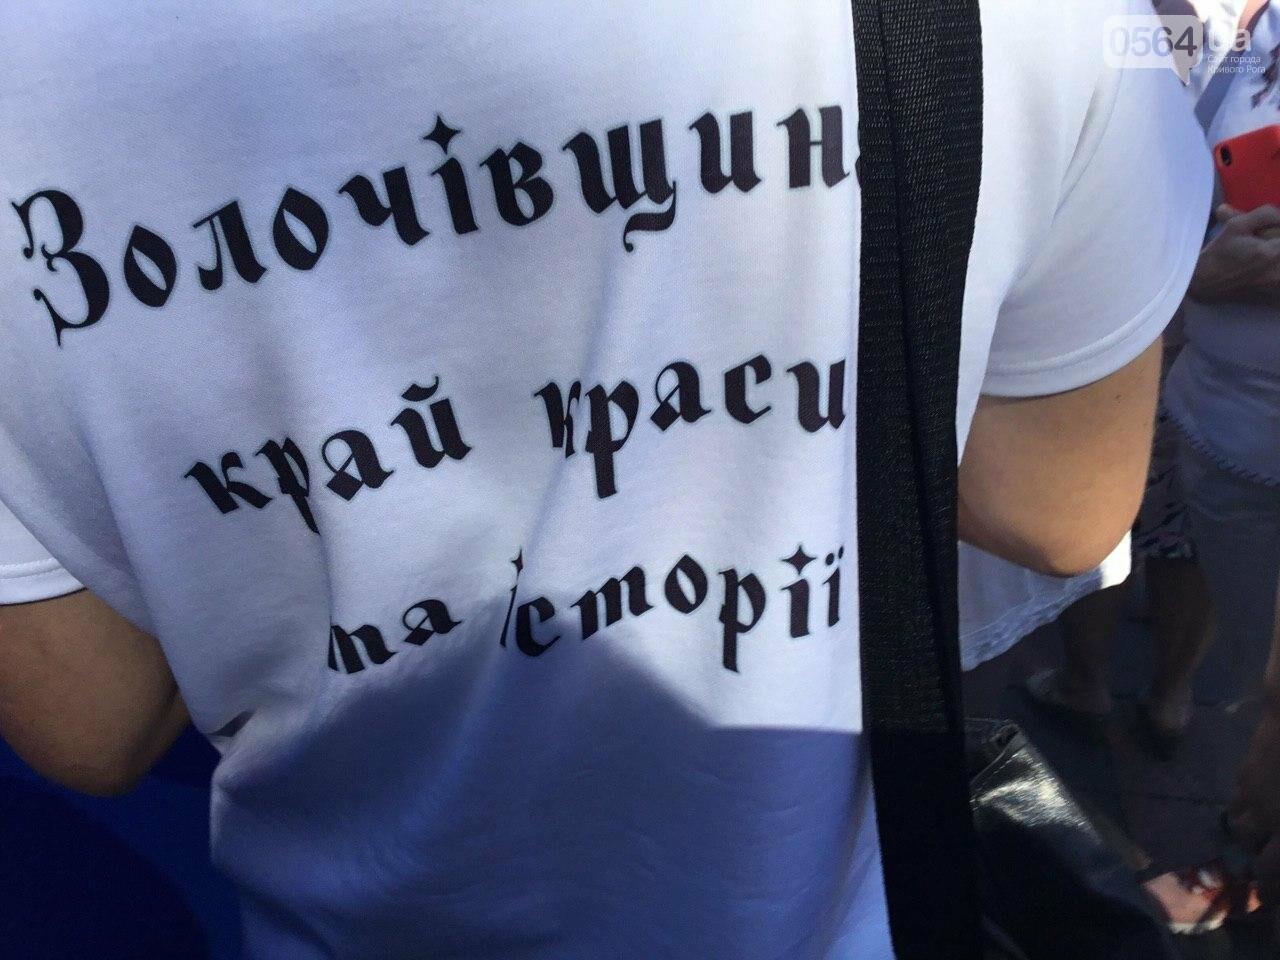 """Руки геть від мови"": под стенами Верховной рады проходит акция протеста, - ФОТО, ВИДЕО, фото-15"